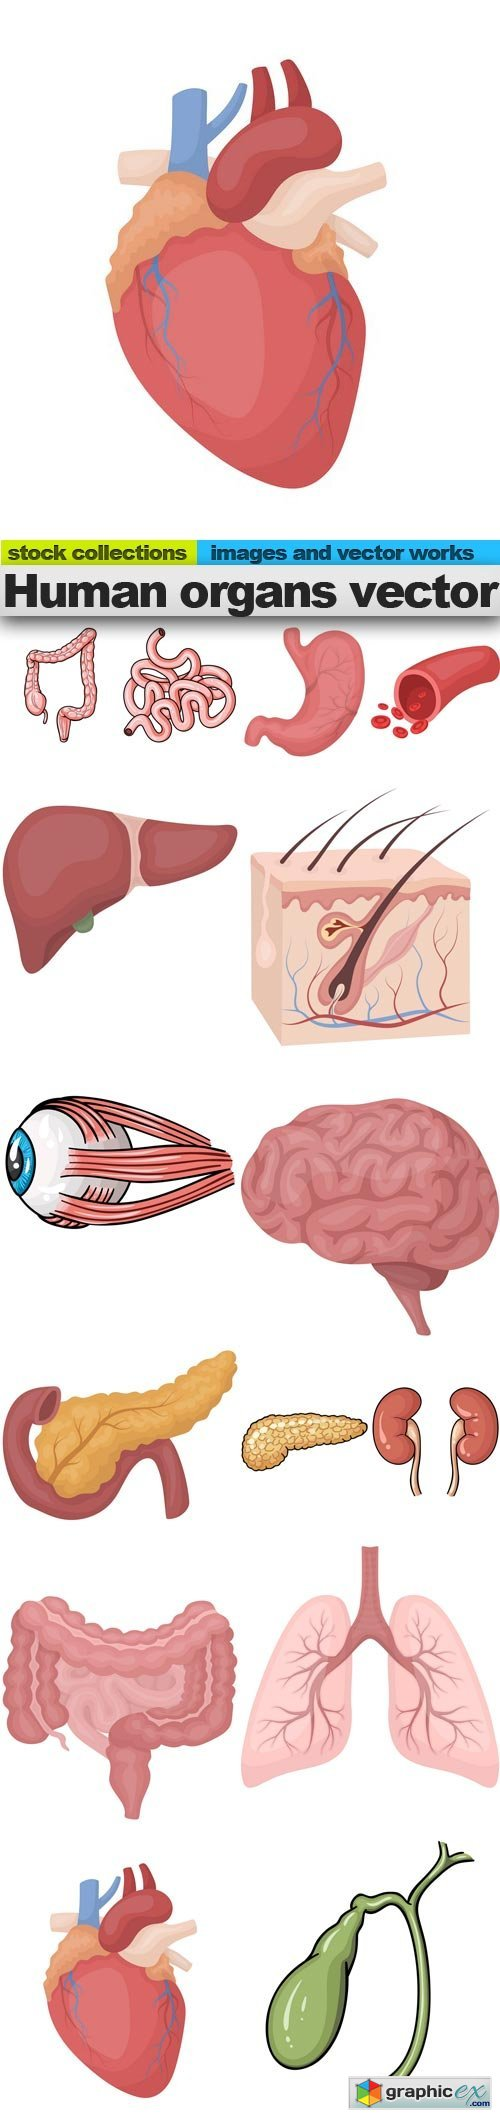 Human organs vector, 15 x EPS